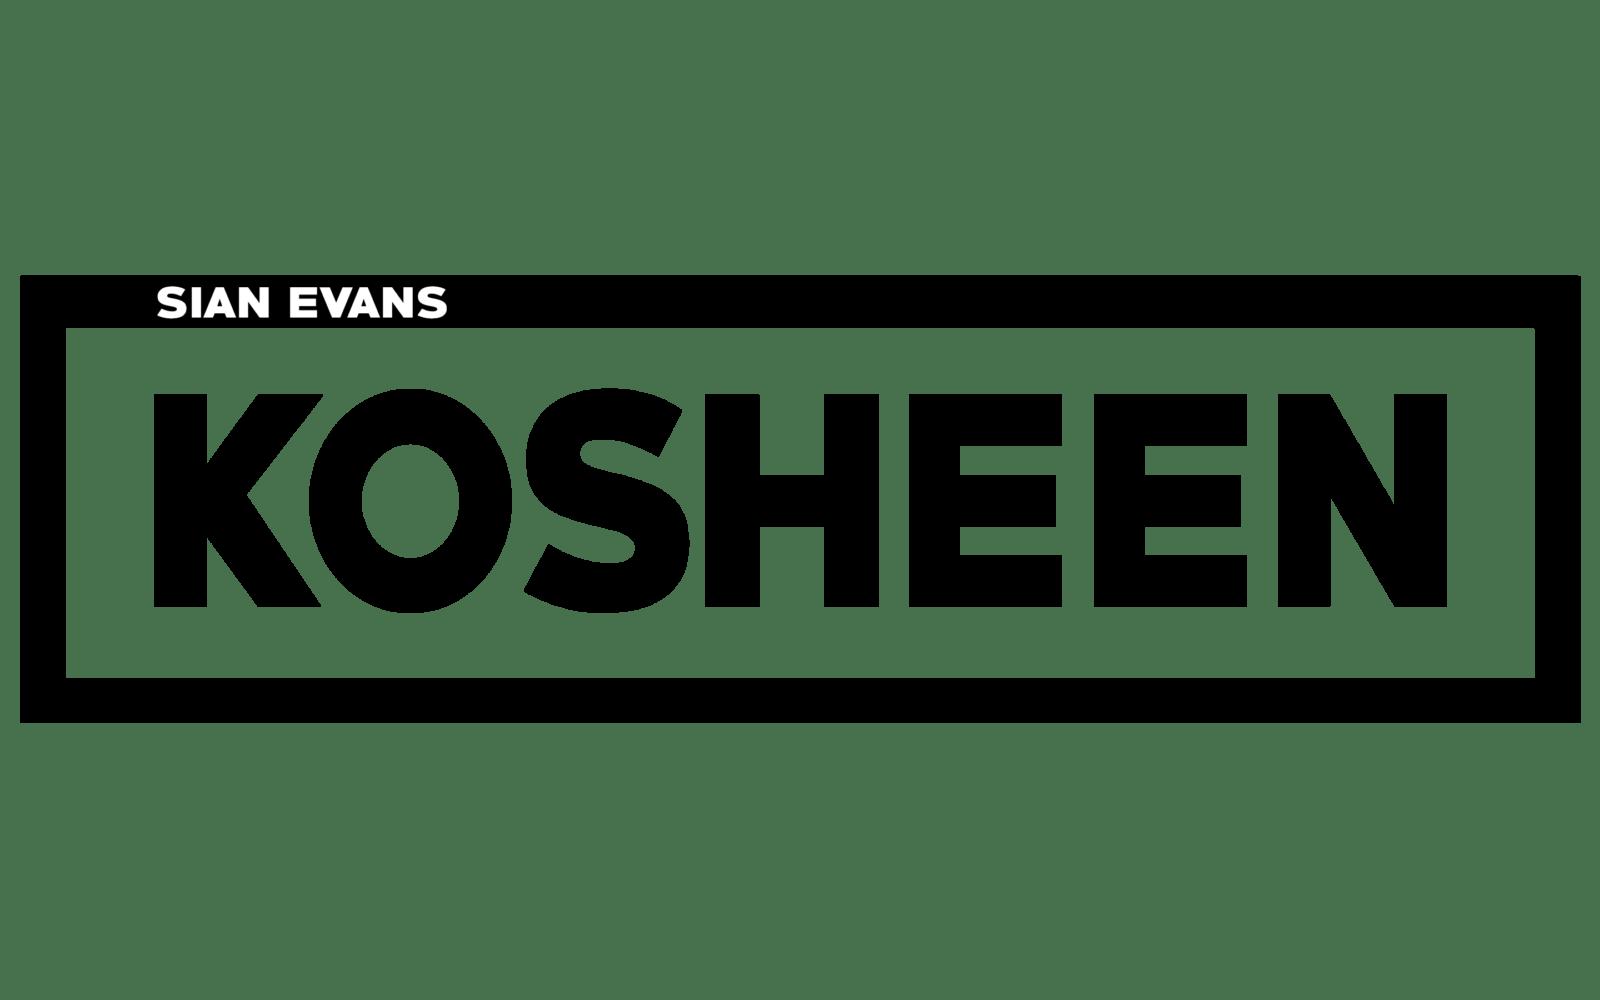 Kosheen Live